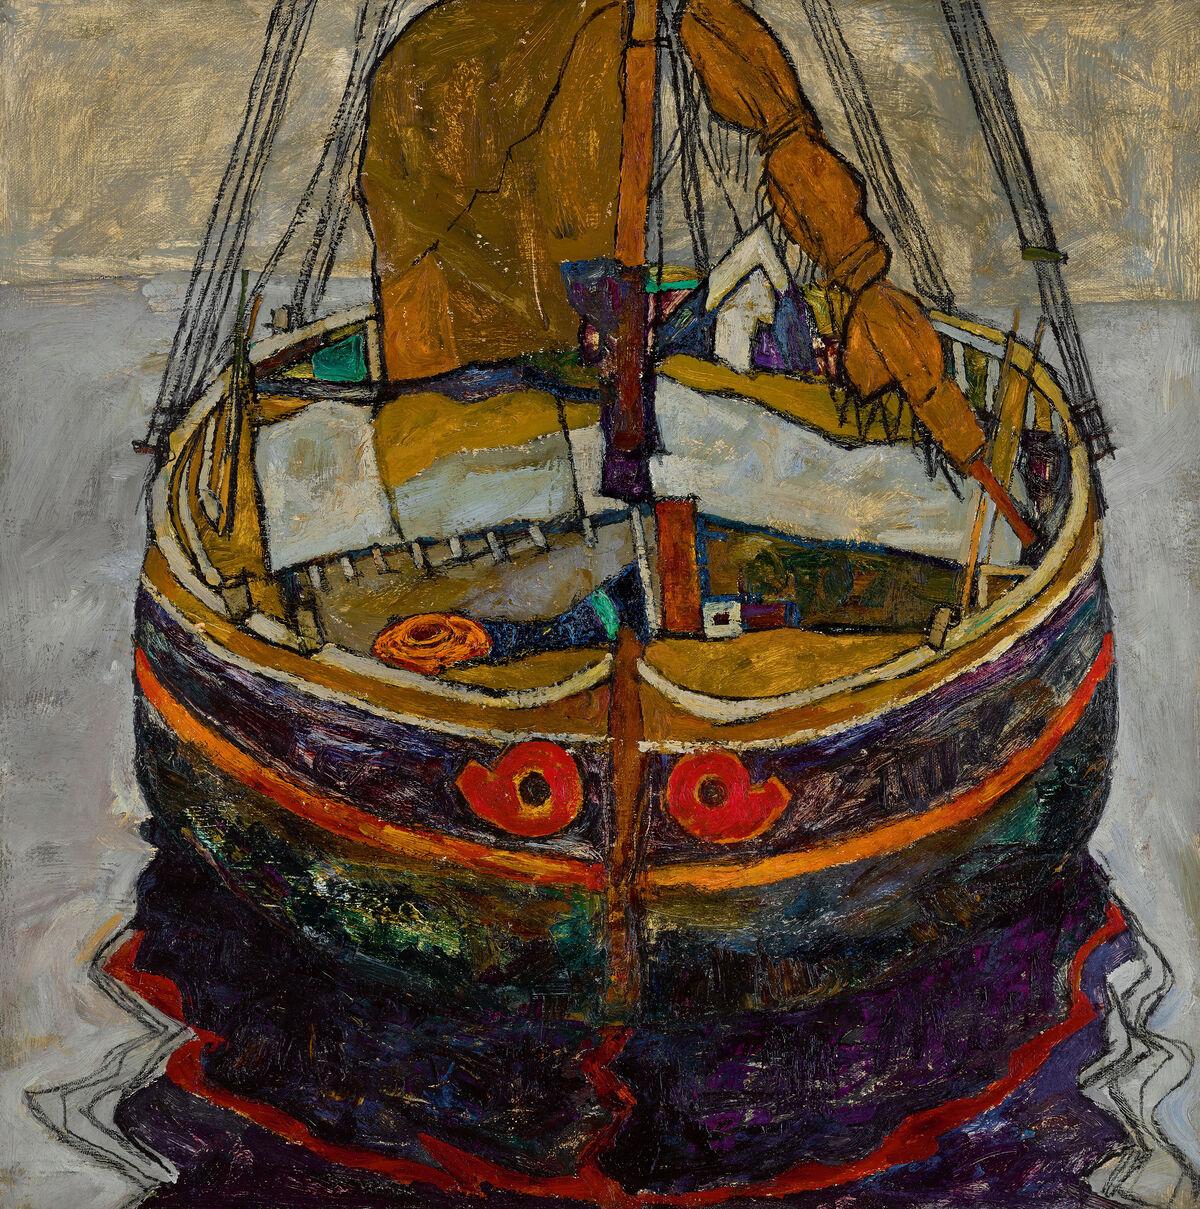 Egon Schiele, Triestiner Fischerboot (Trieste Fishing Boat), 1912. Courtesy of Sotheby's.